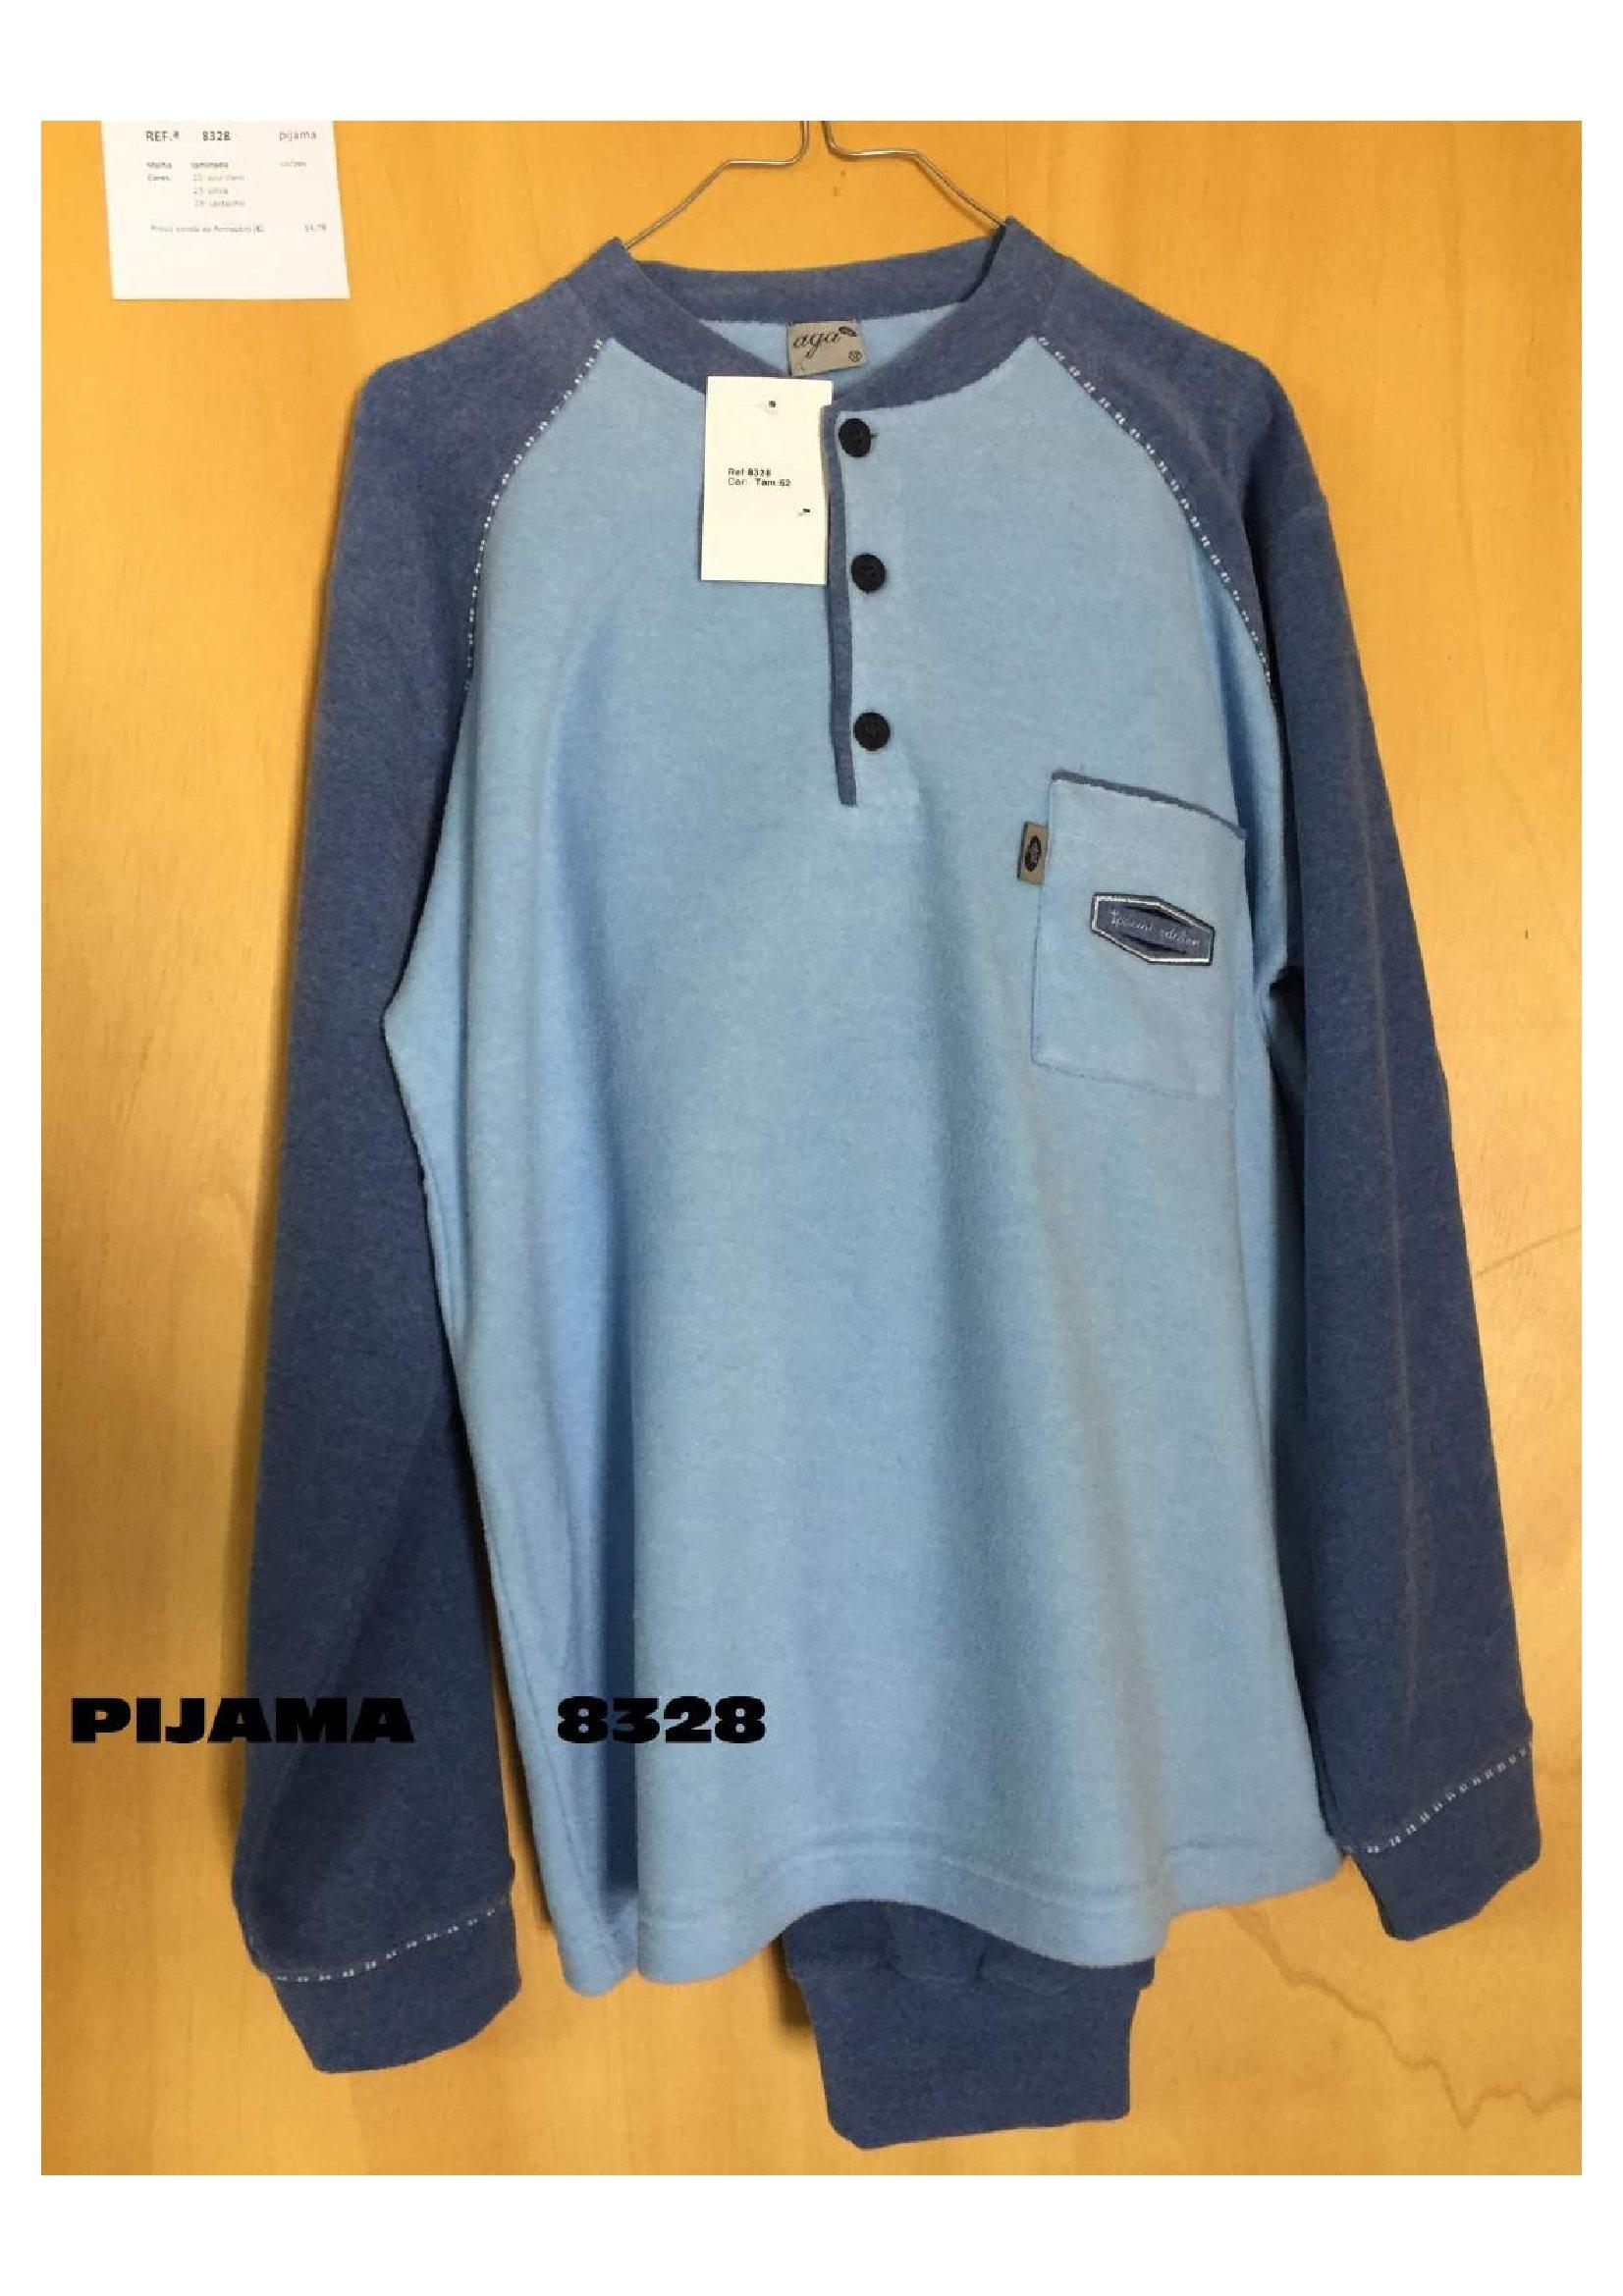 Pijama largo polar tapeta hombre bolsillo puño AGA